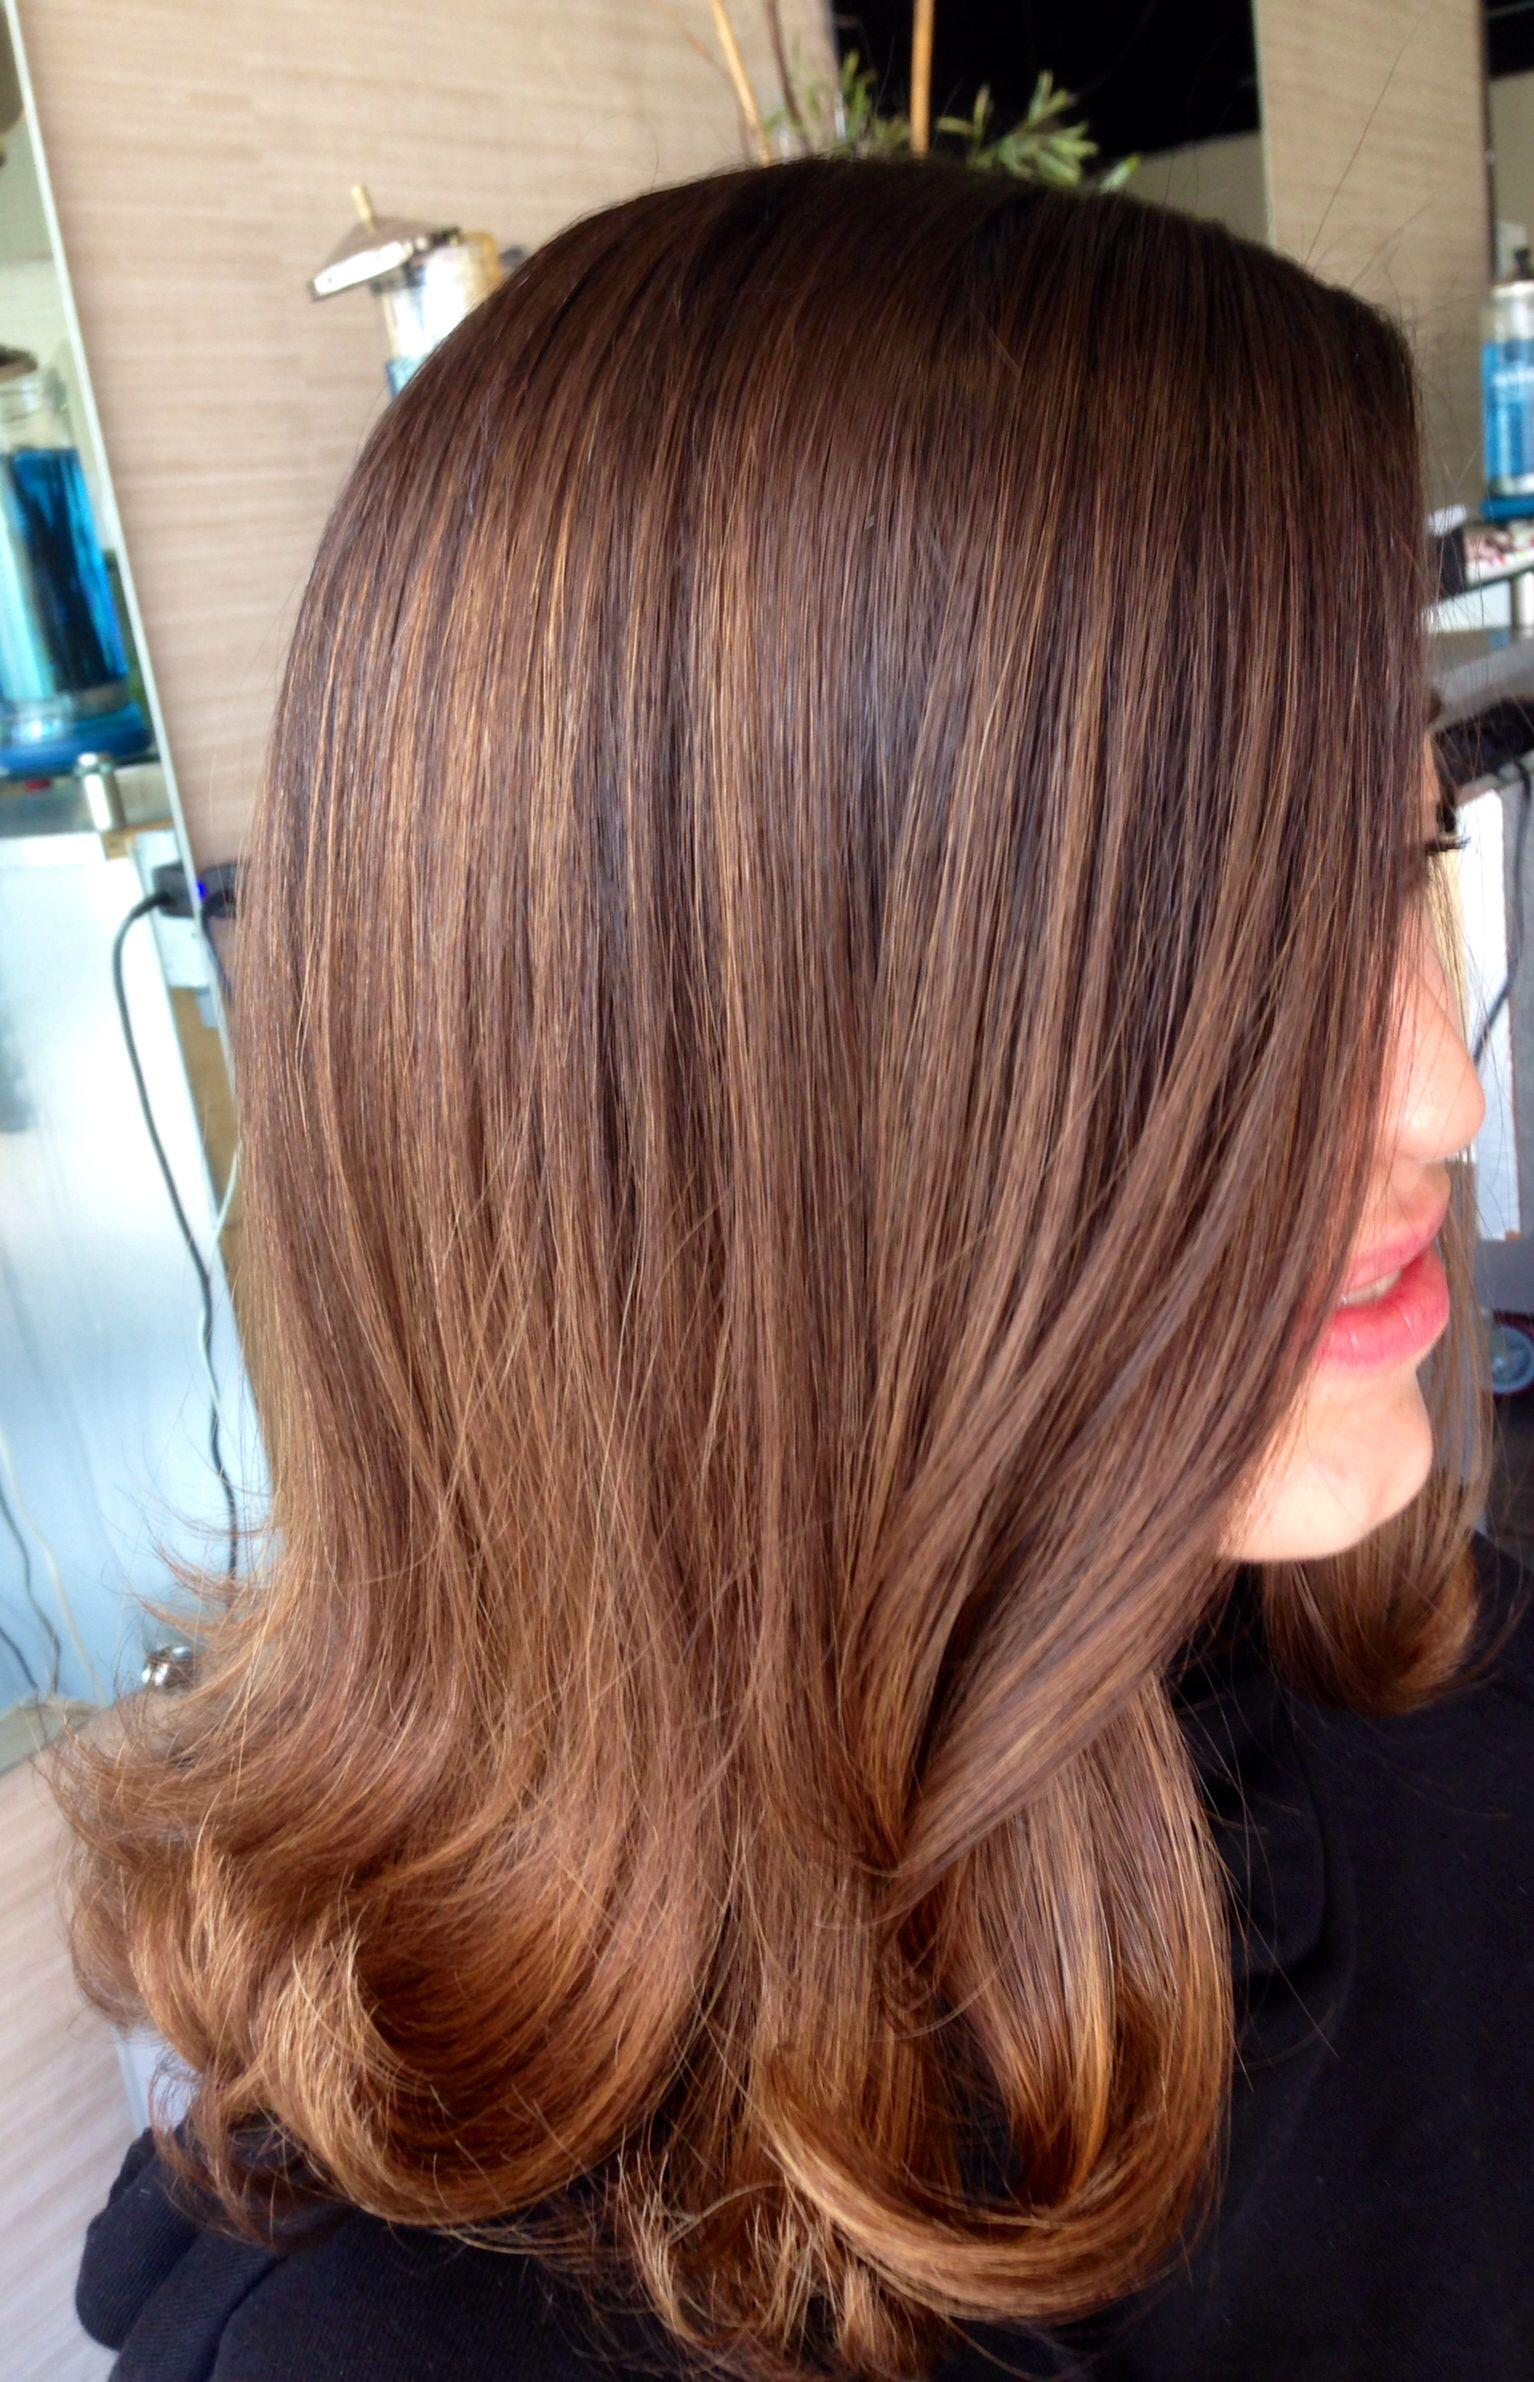 Shades Of Brown Brunette Hair Color Brown Hair Color Shades Brown Hair Color Chart